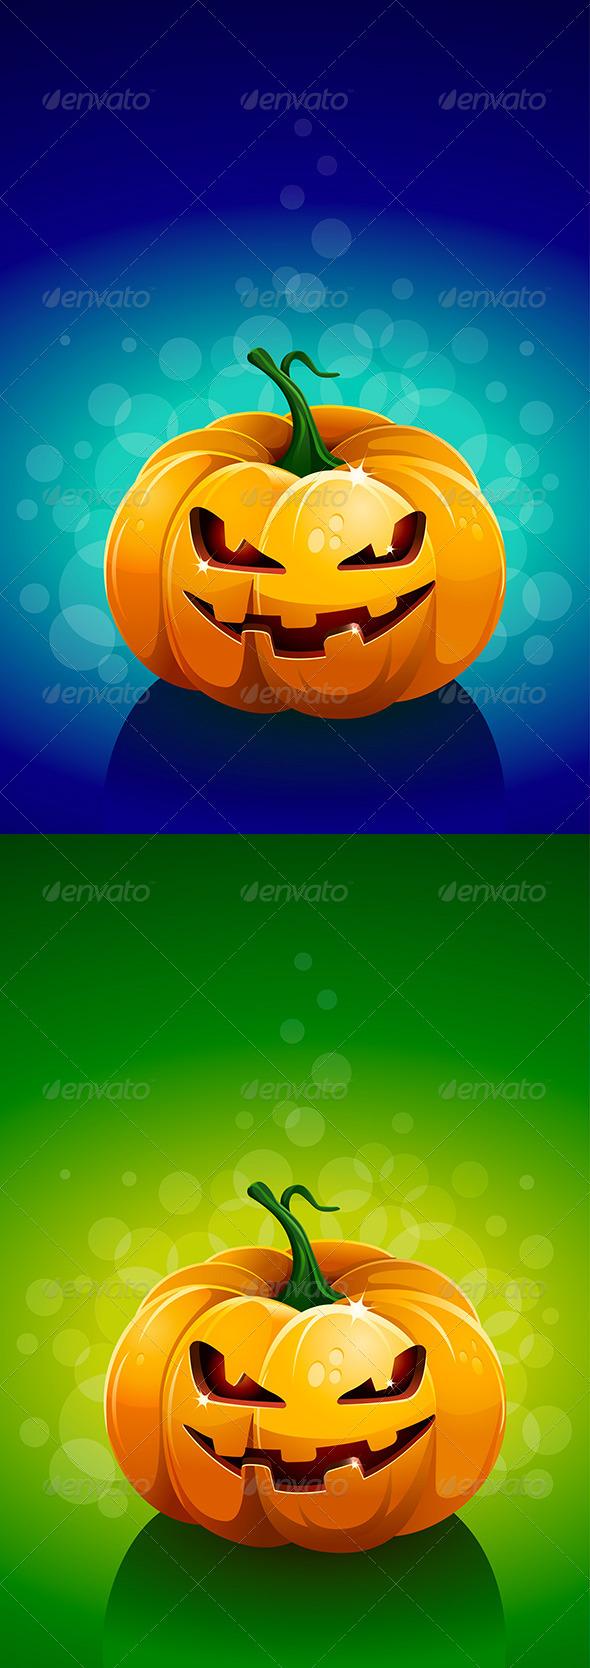 GraphicRiver Smiling Pumpkin 4611522